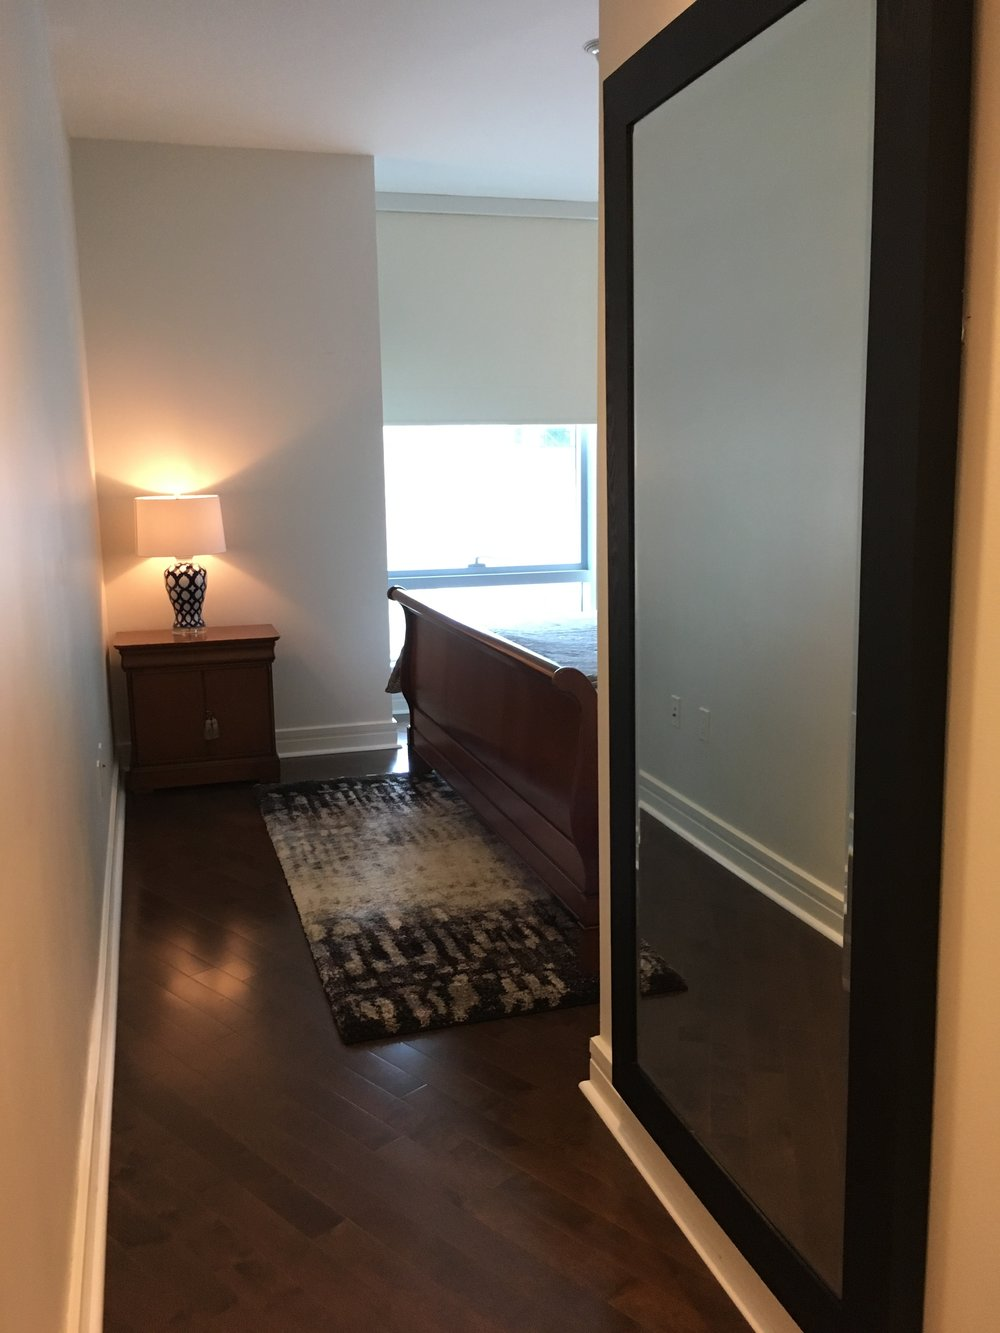 Philadelphia Luxury Home Condo-the ritz carlton residences 15A bryant wilde realty12.JPG